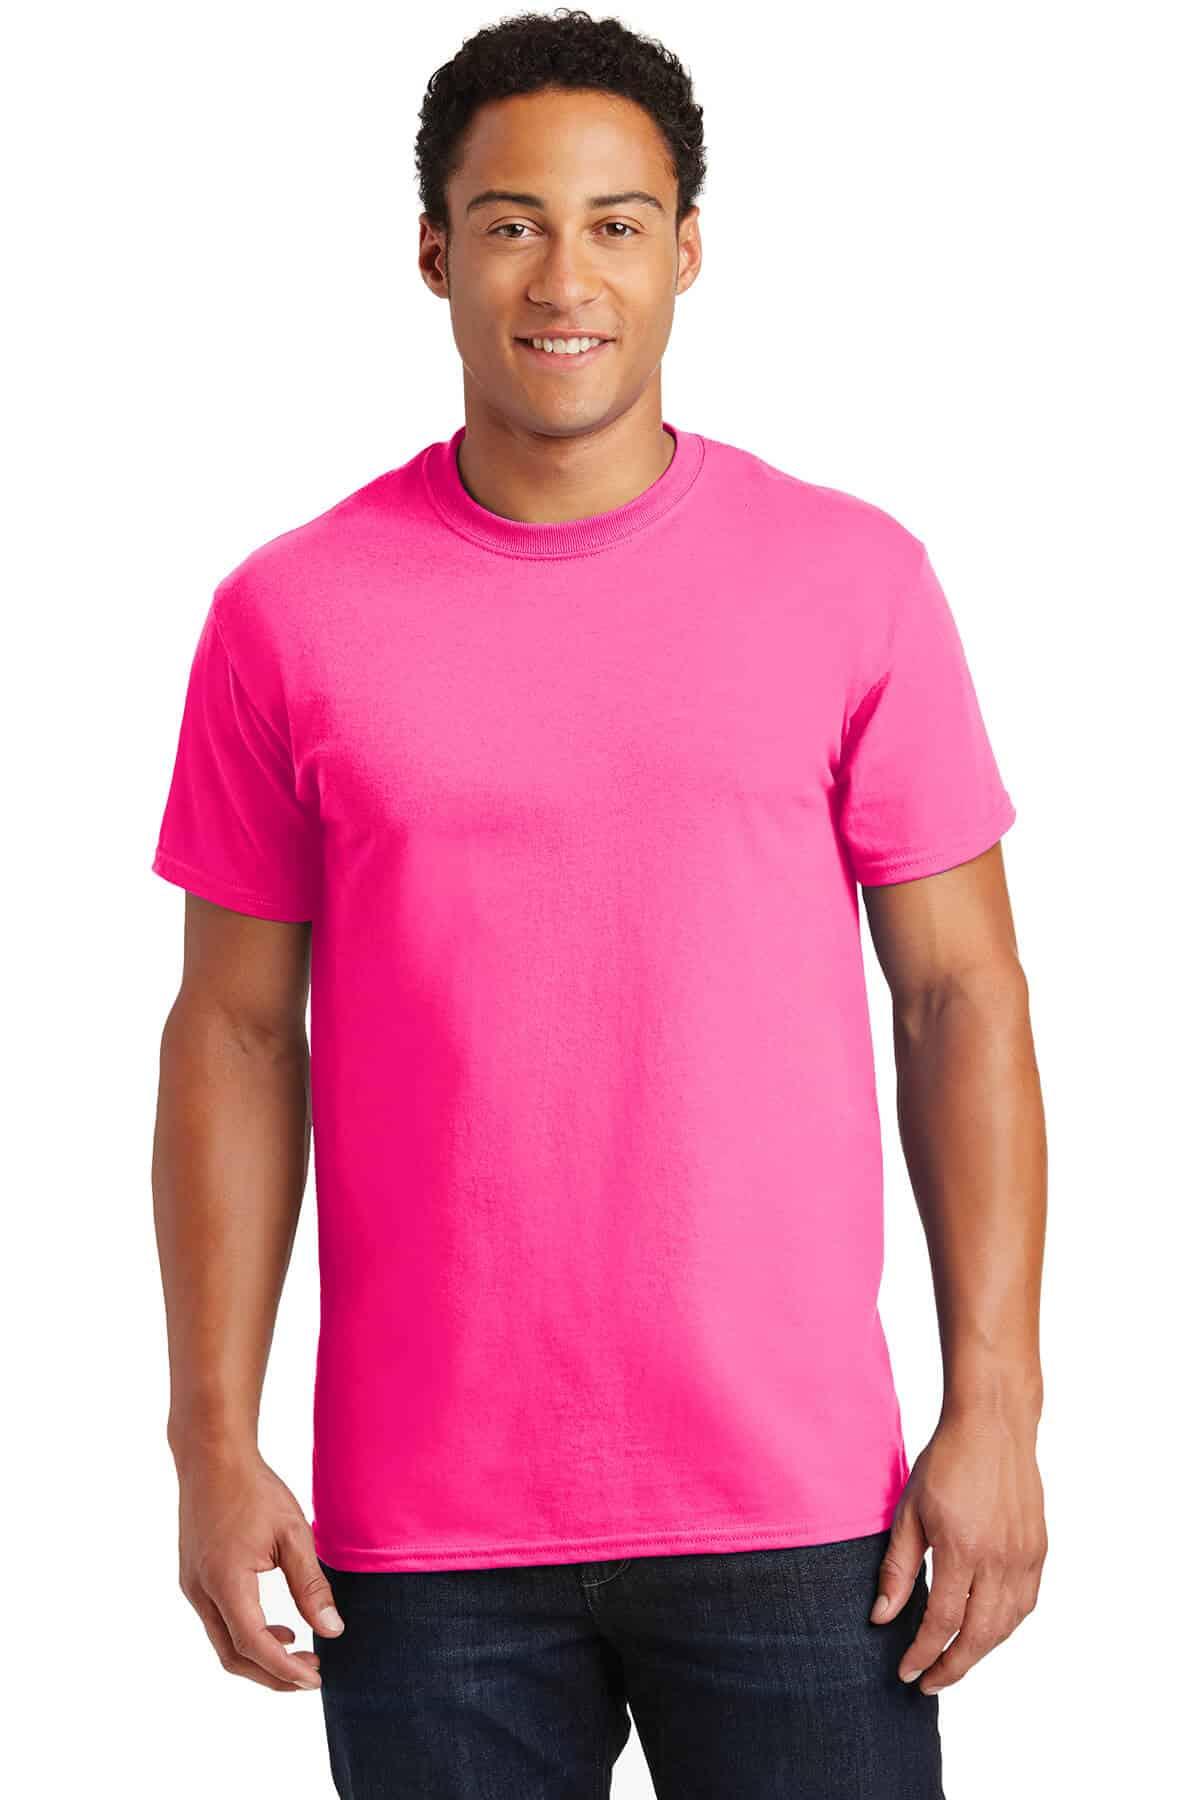 Safety Pink Teeshirt Front